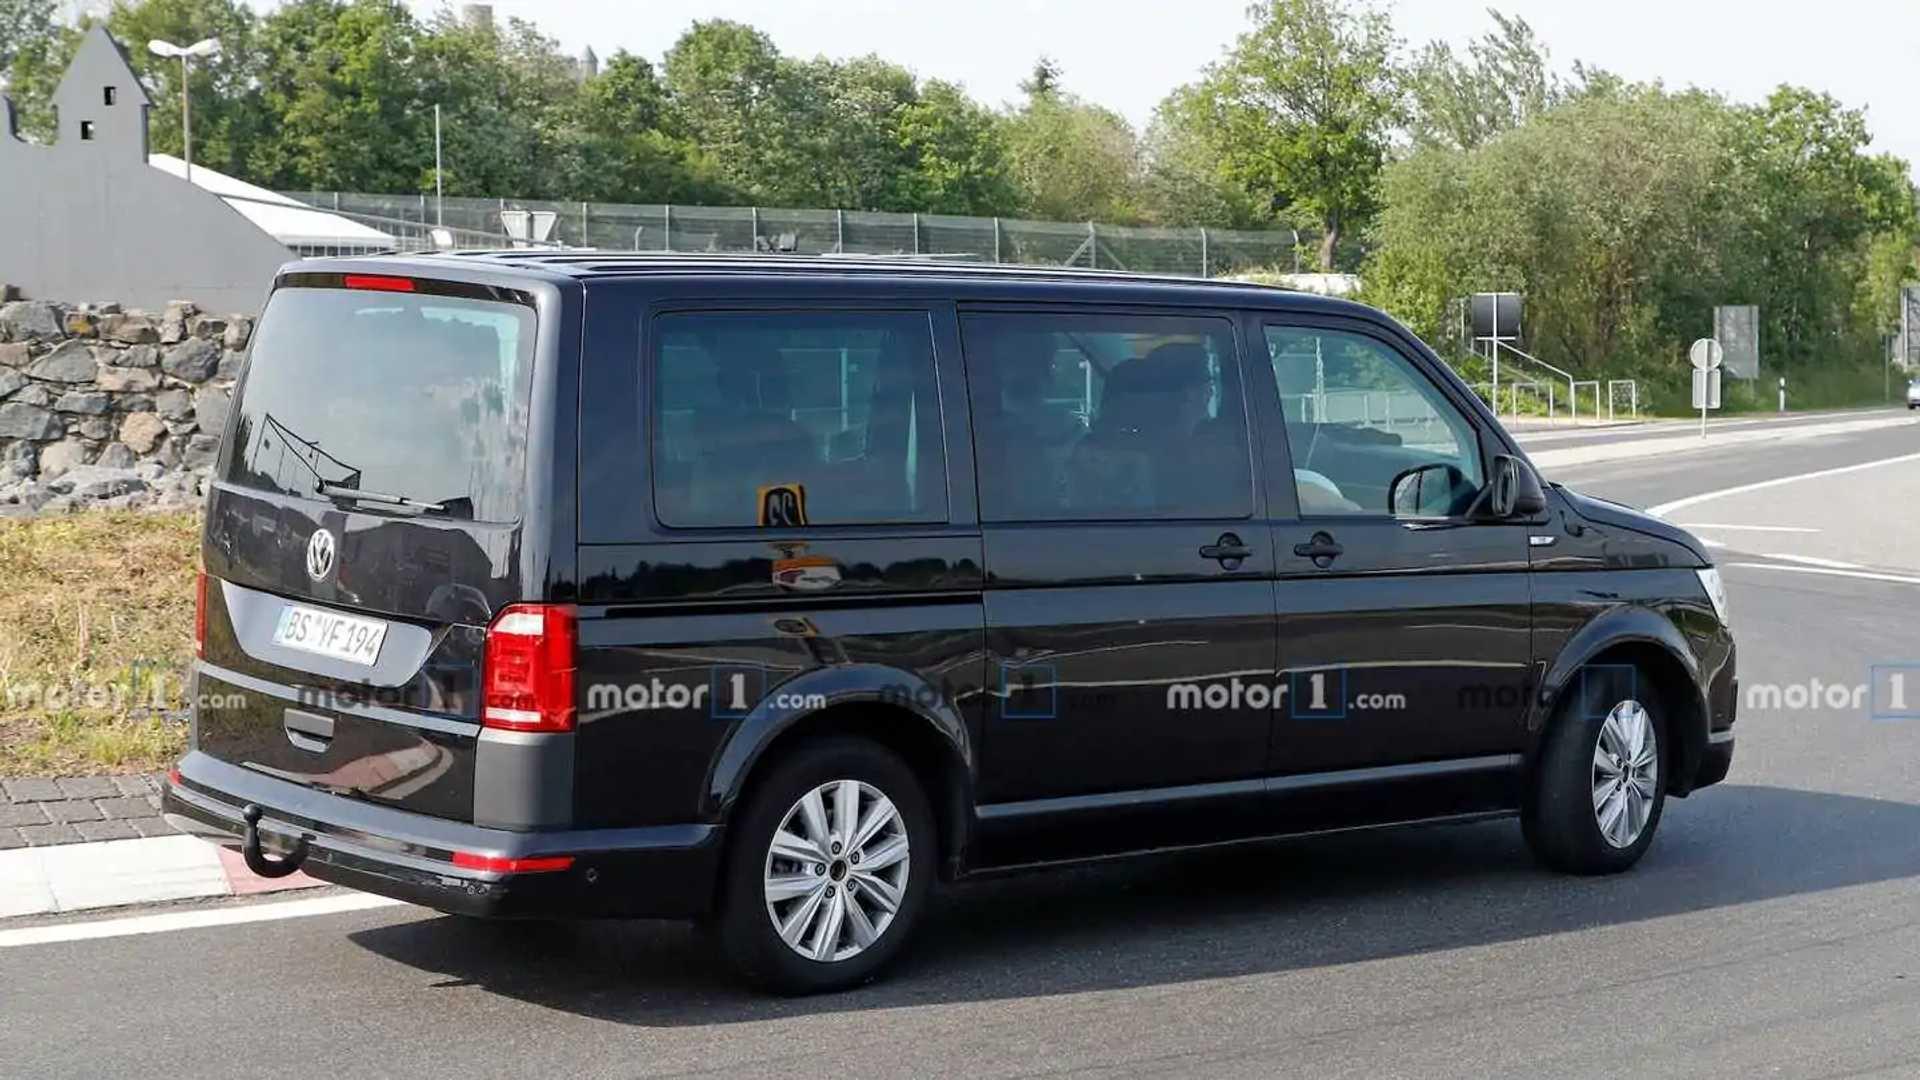 2021 - [Volkswagen] Transporter [T7] Volkswagen-transporter-t7-latest-test-mule